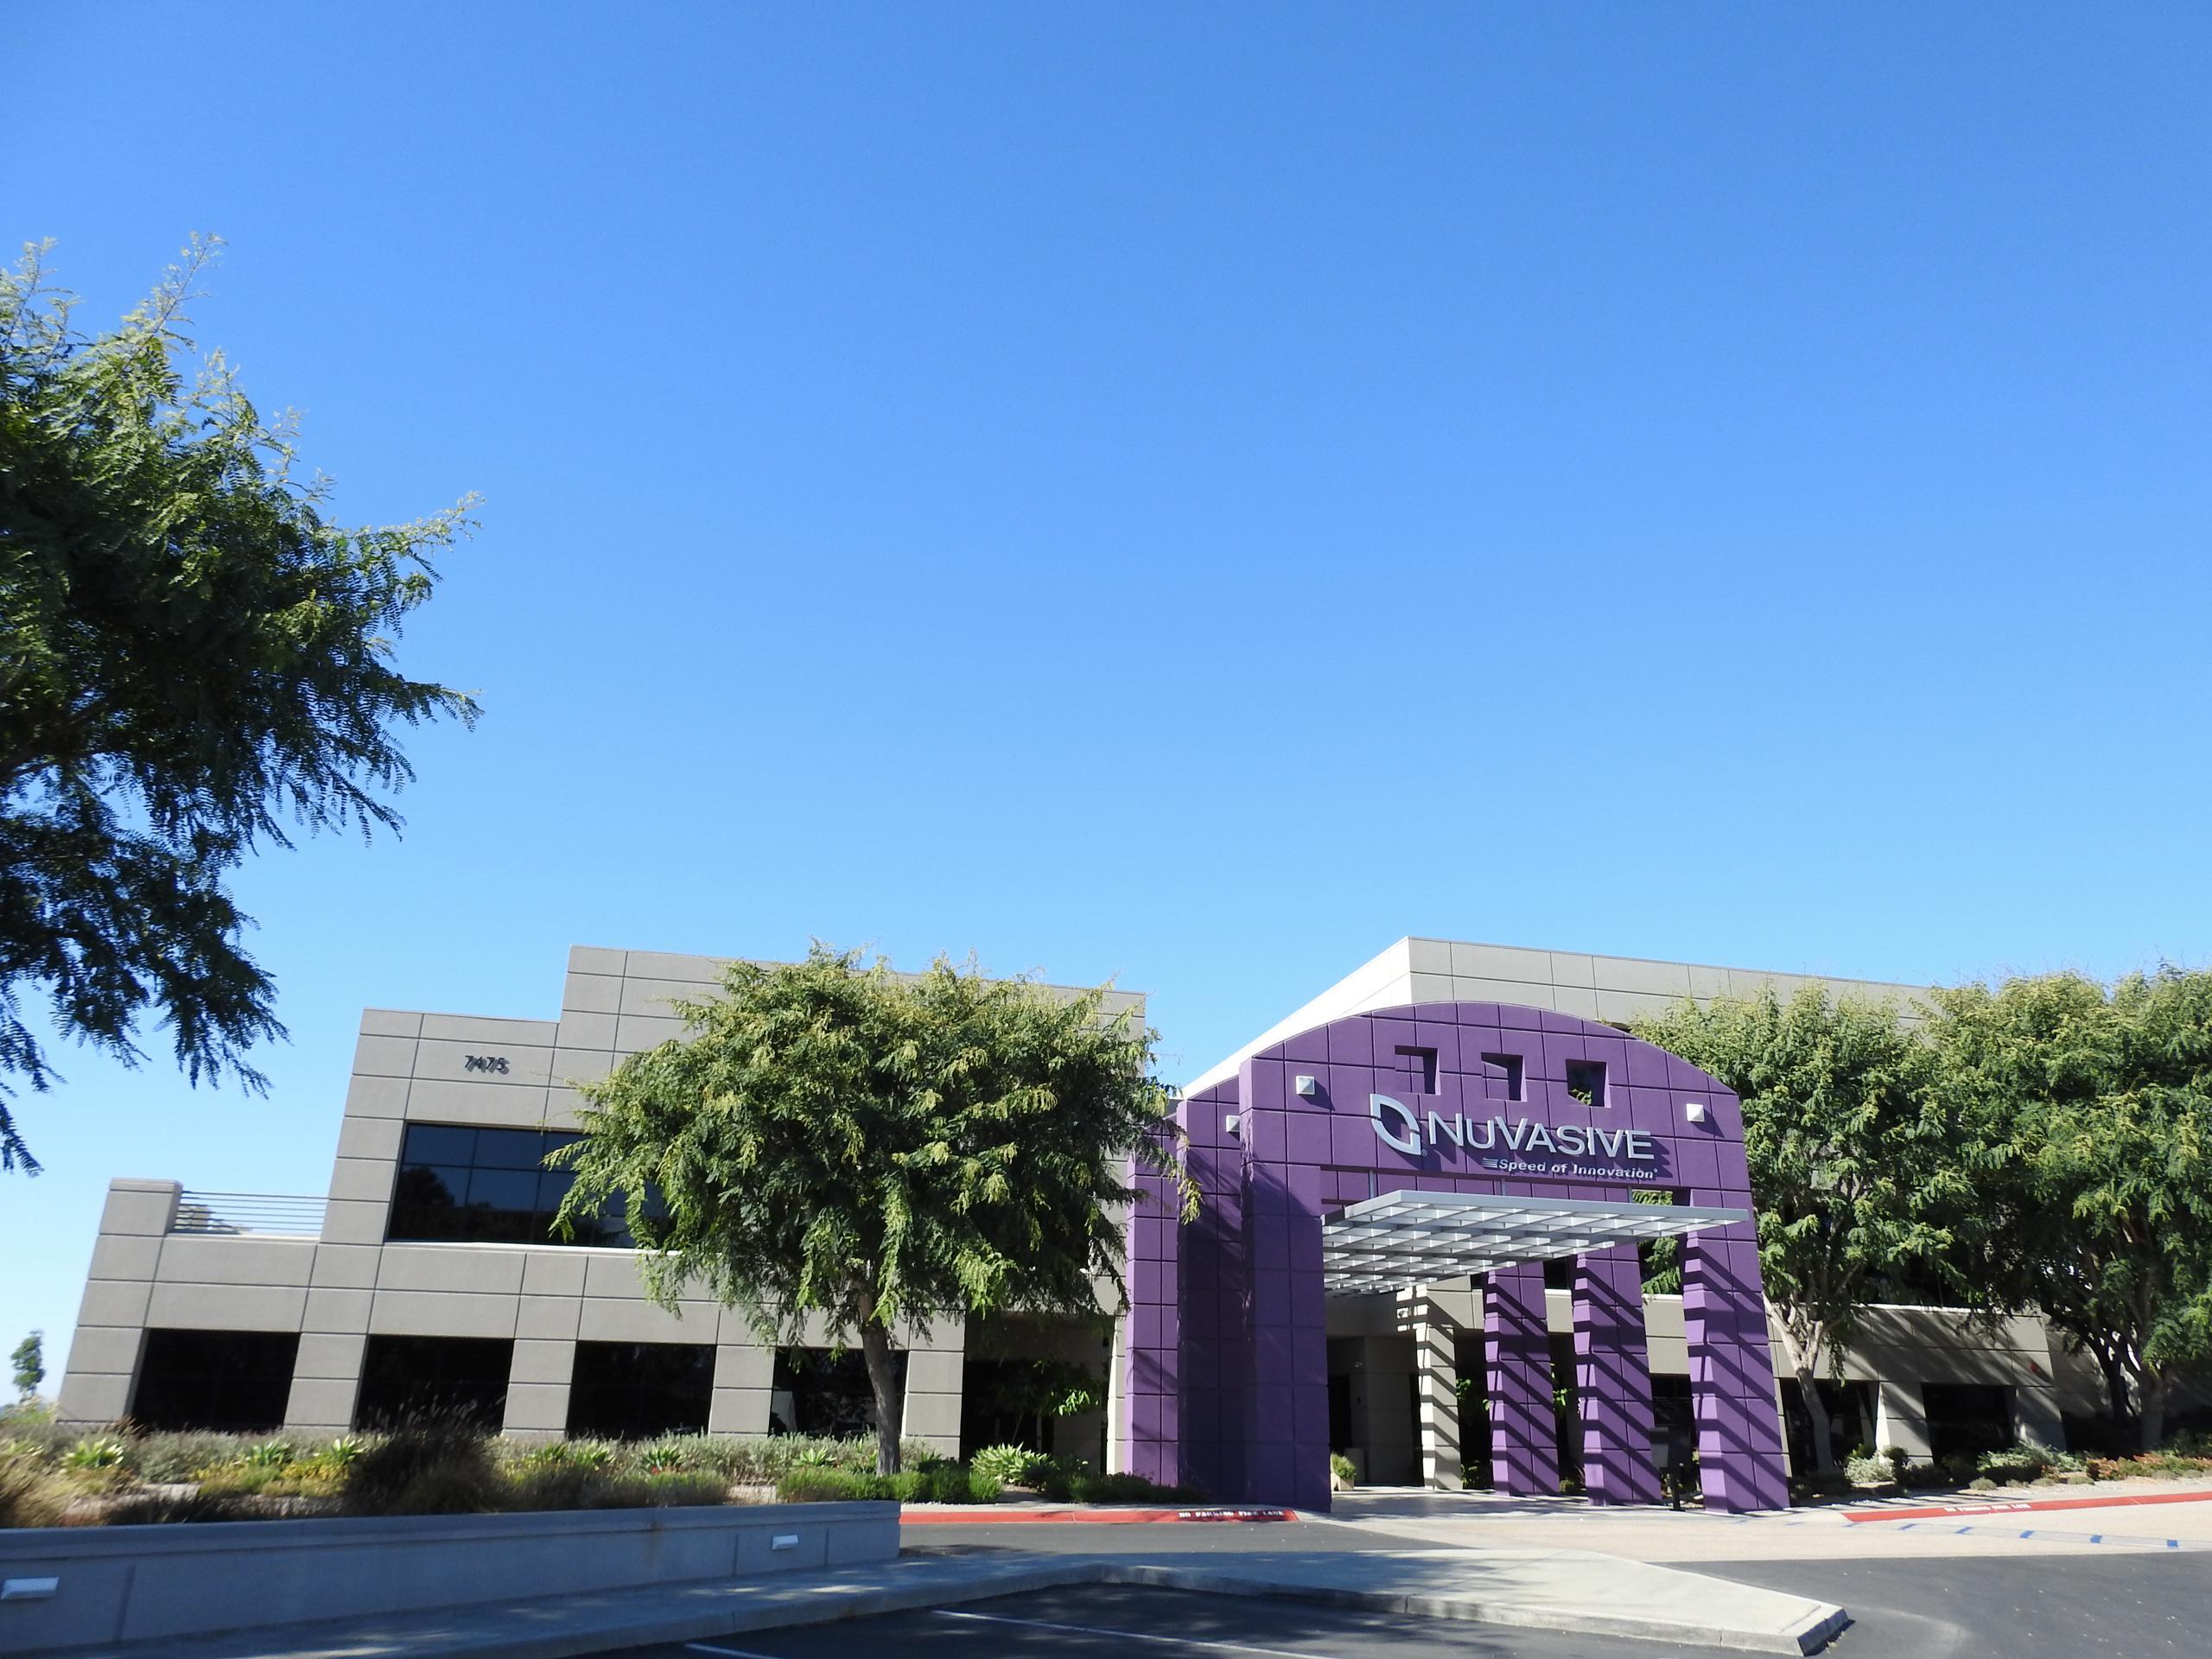 NuVasive's corporate headquarters in San Diego, California.